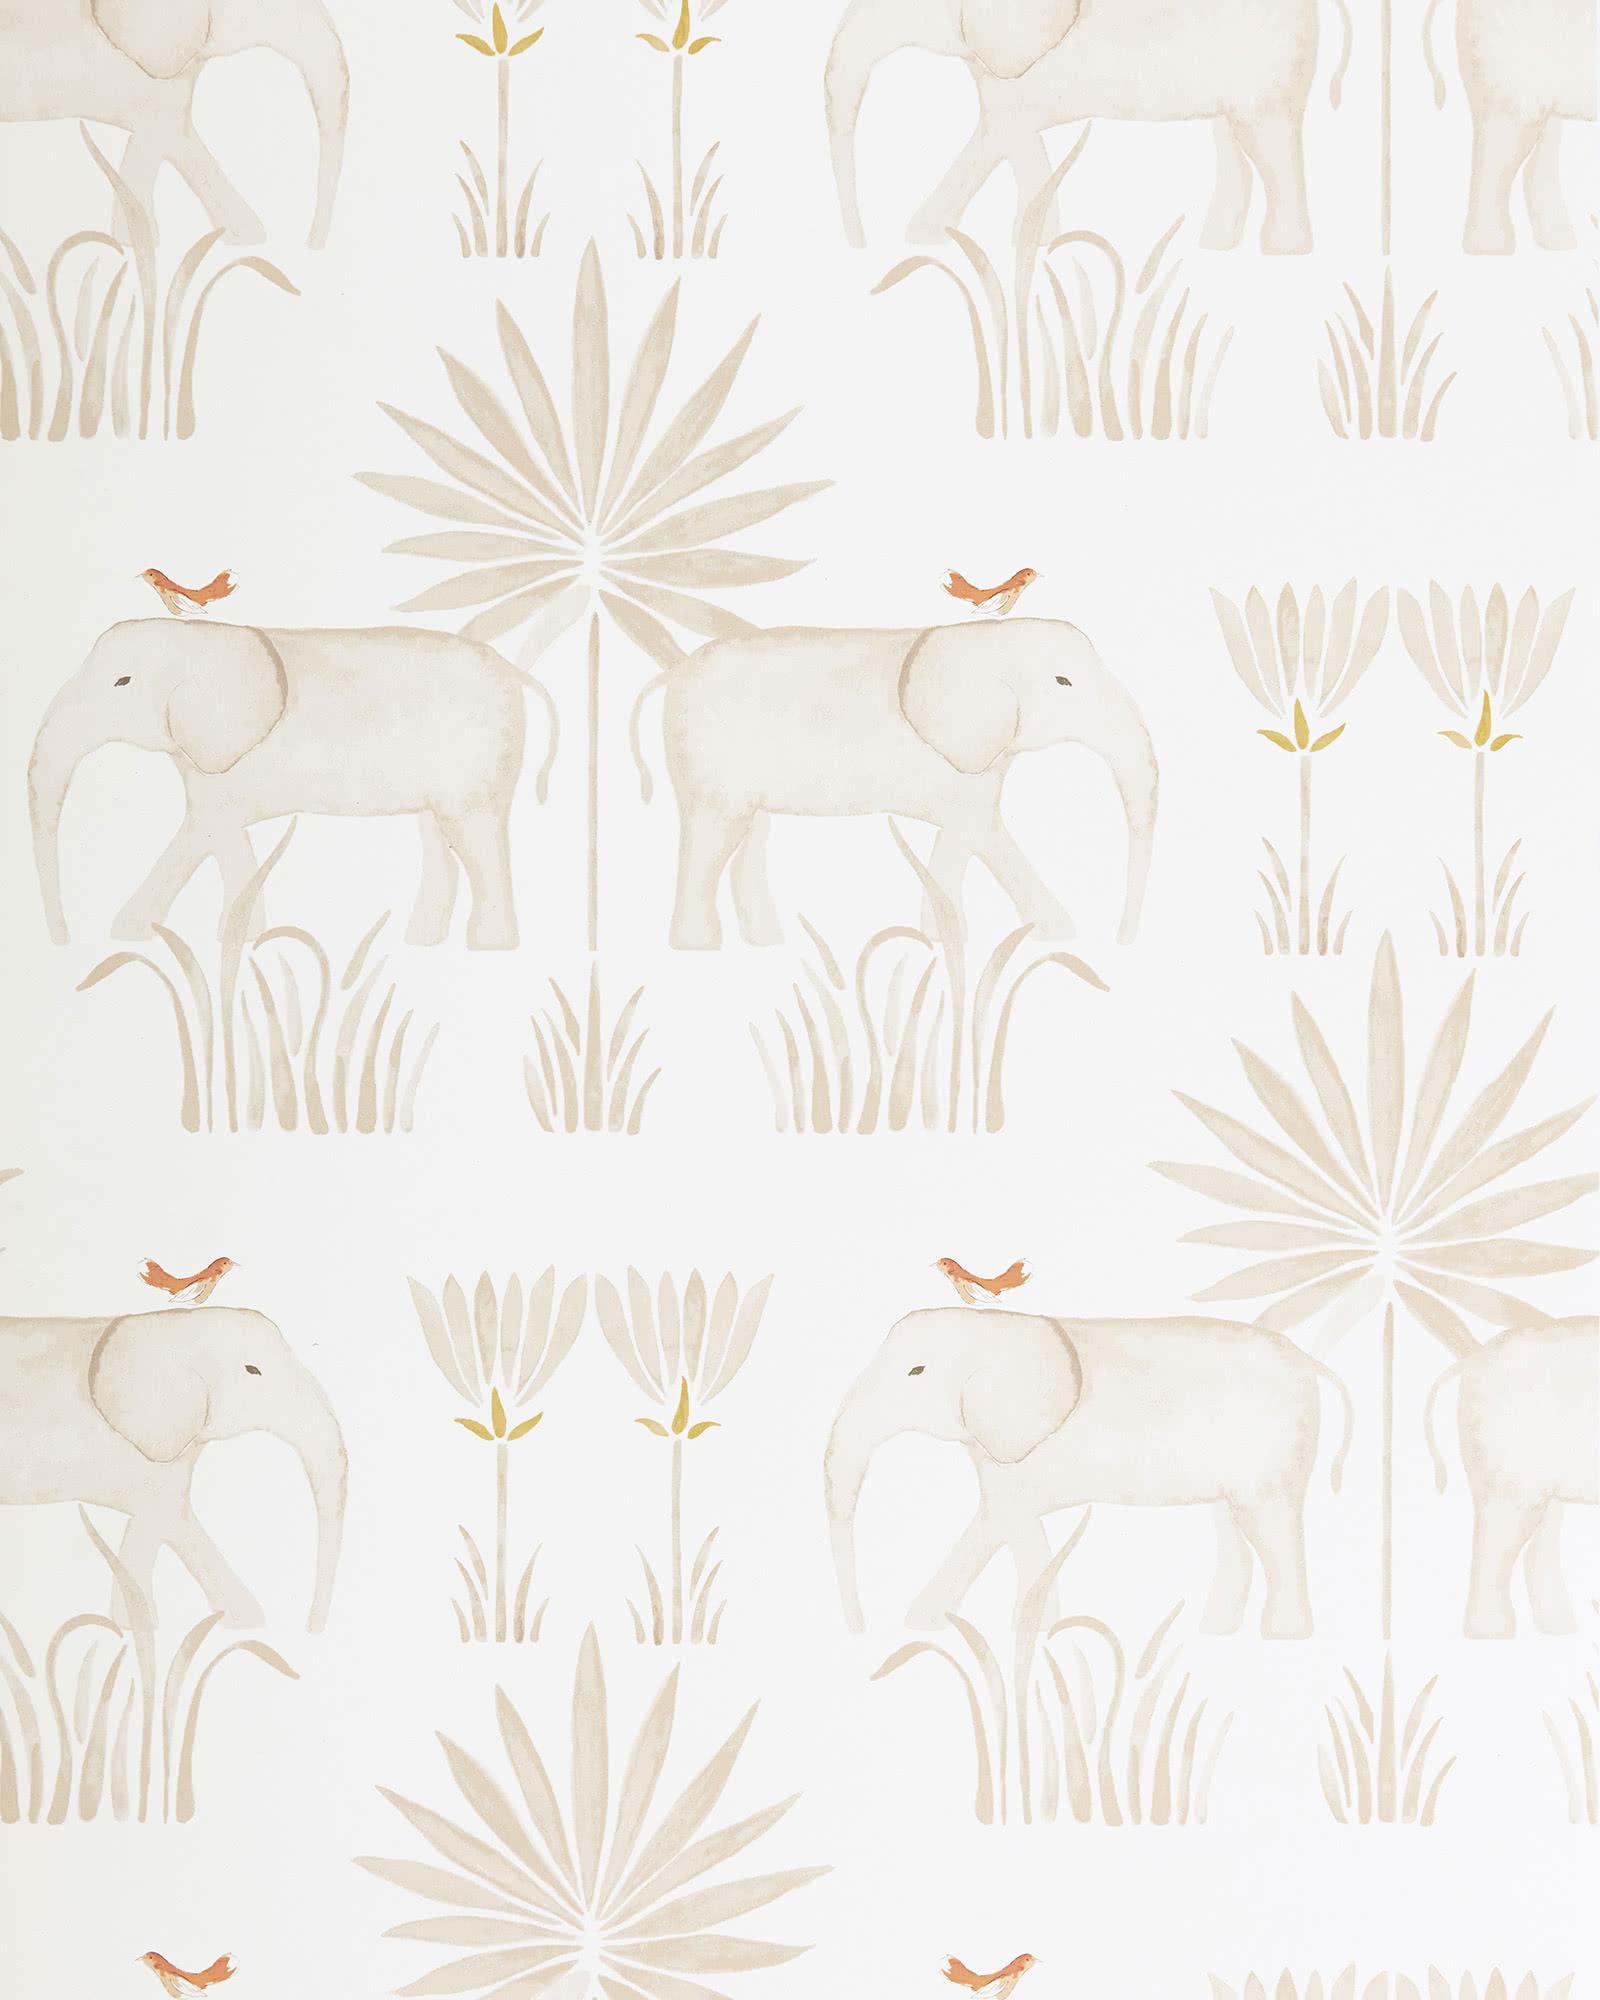 Serena Lily Kalahari Elephant Safari Wallpaper